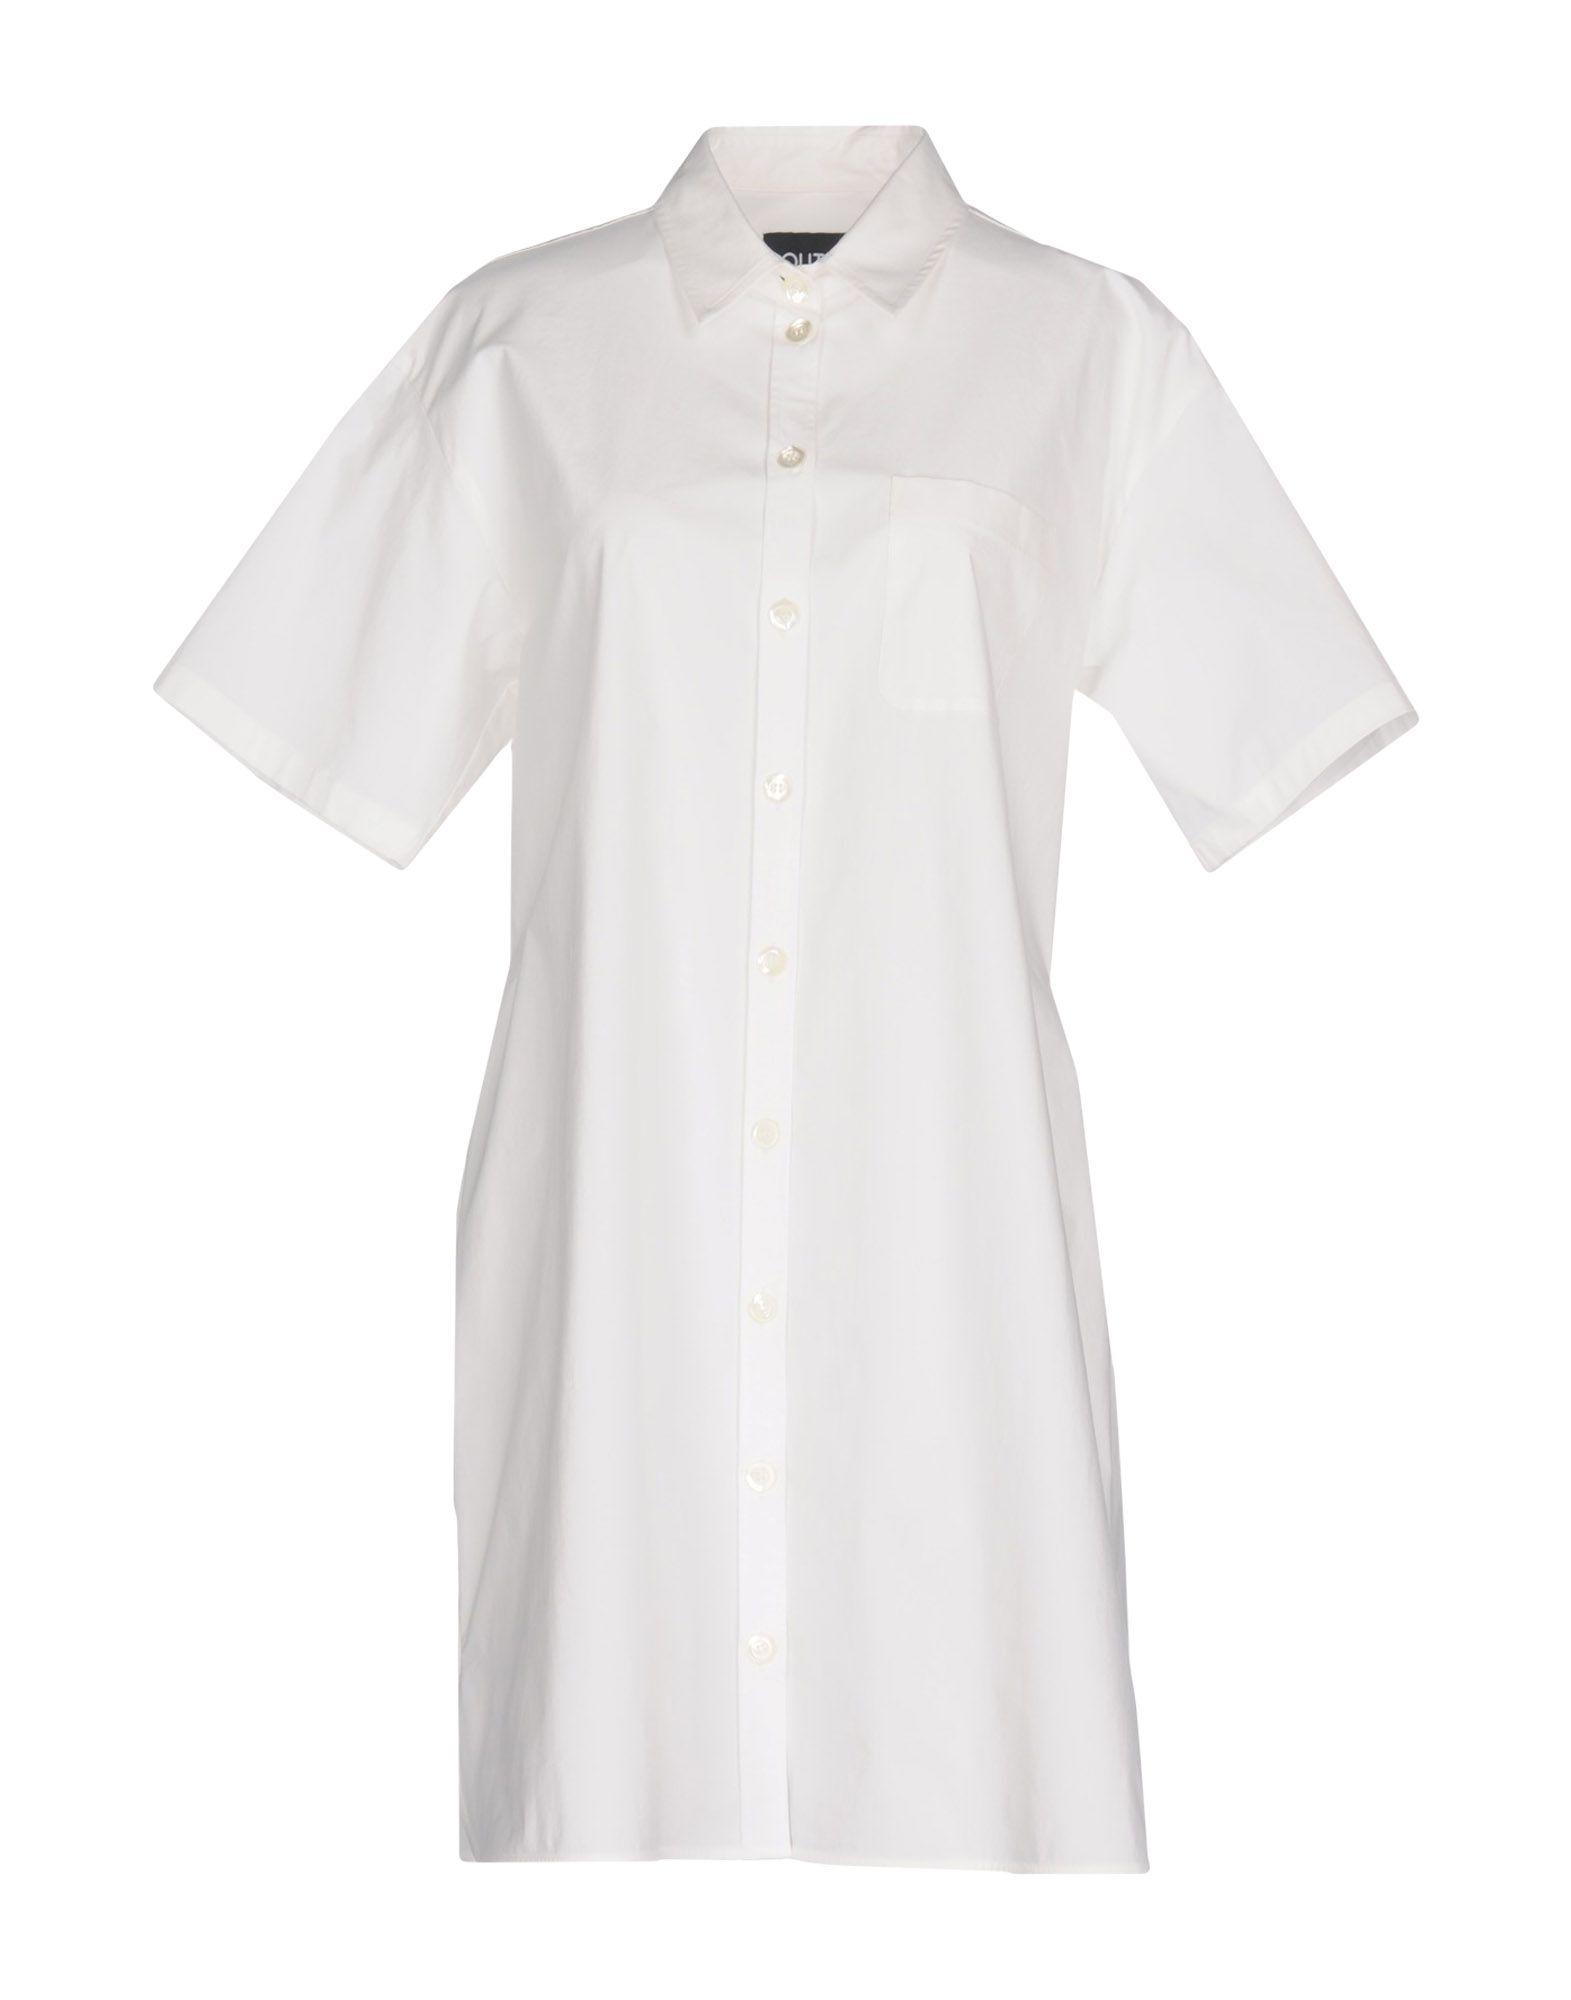 BOUTIQUE MOSCHINO Короткое платье платье рубашка fox yulia sway платье рубашка fox